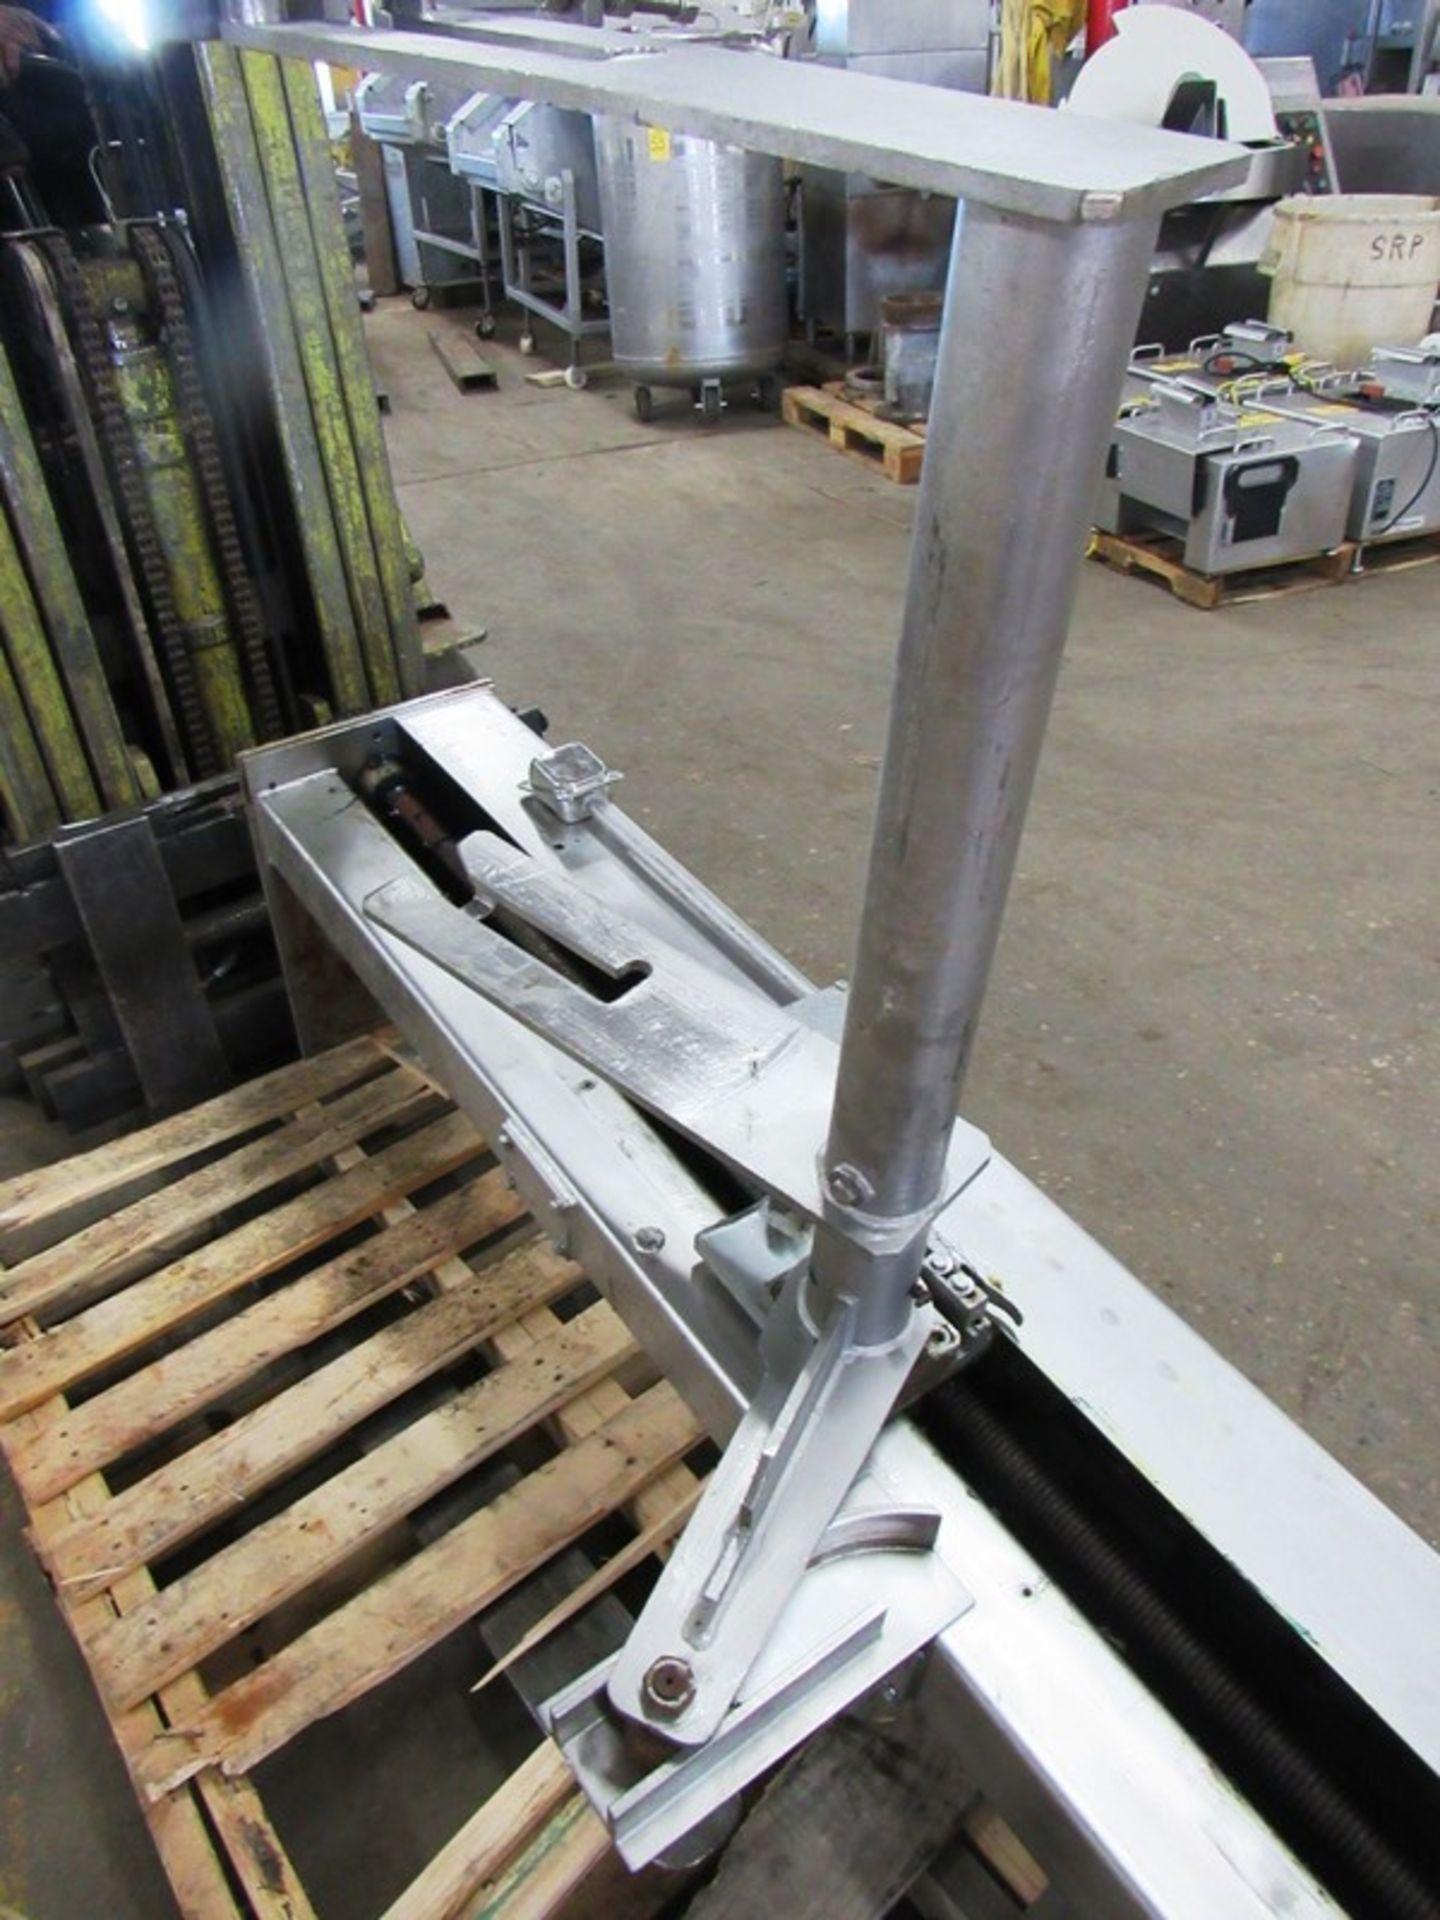 "Lot 58 - Formax Stainless Steel Column Dumper, Ser. #FBL662, adjustable height, set at 55"", 9' Tall overall"